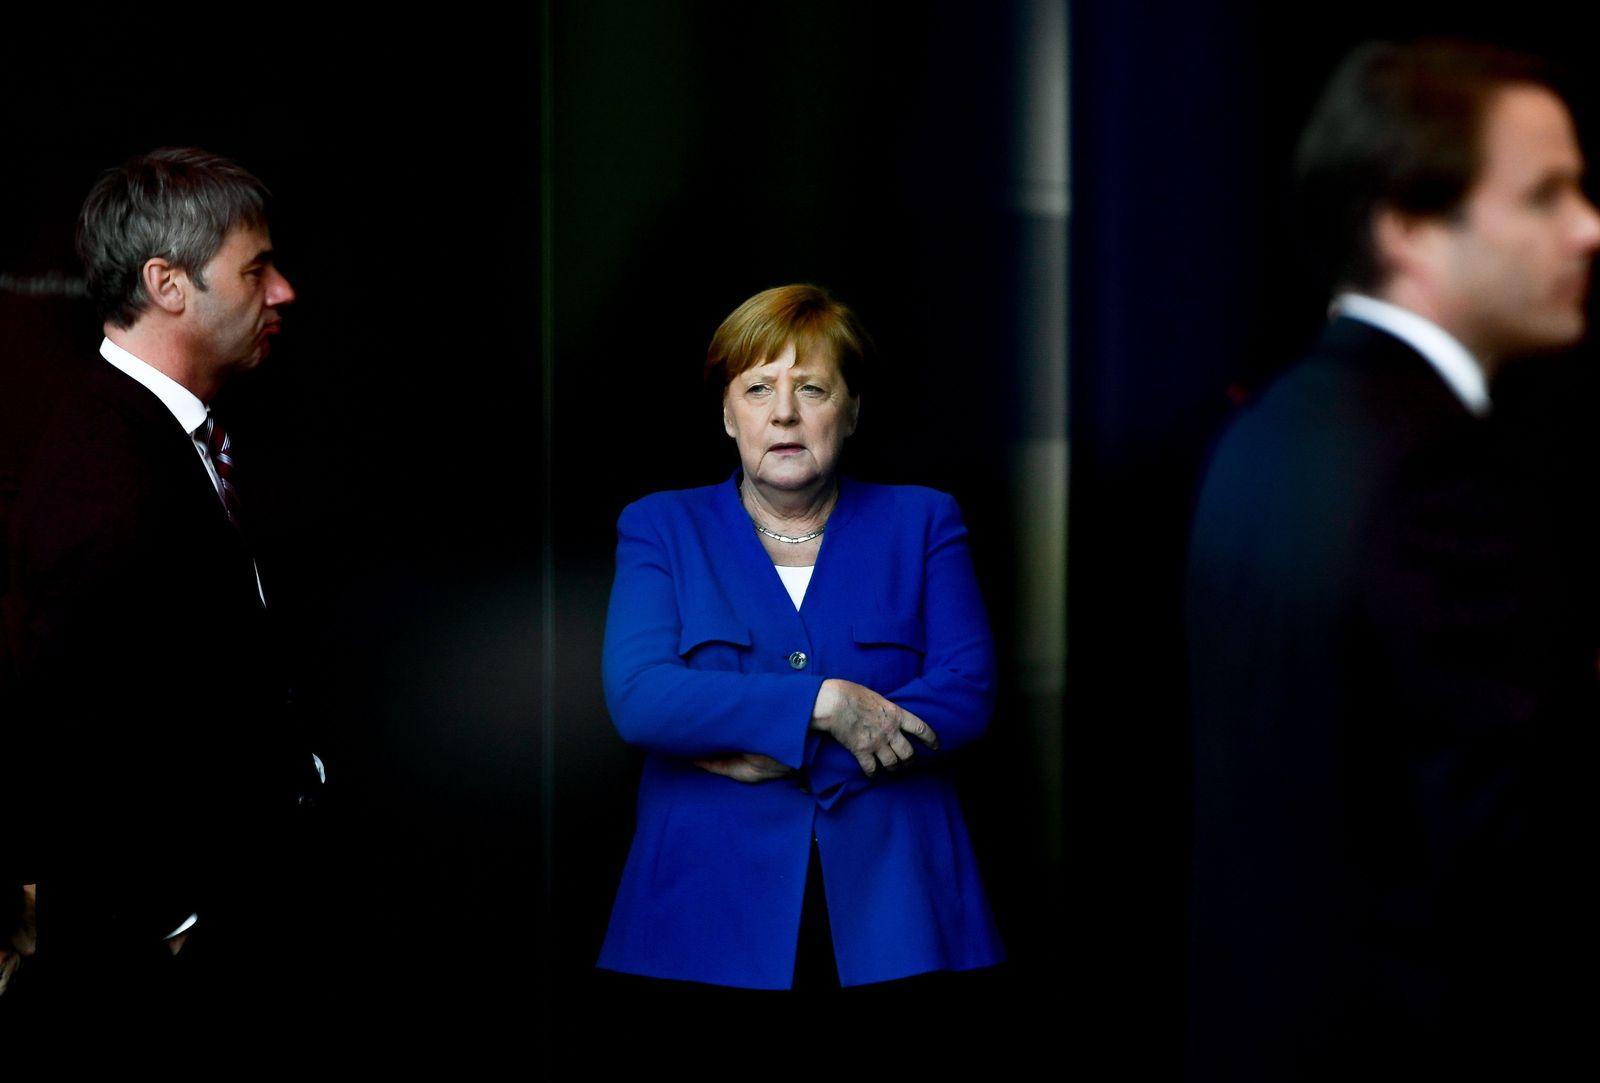 Merkel/ Weltordnung